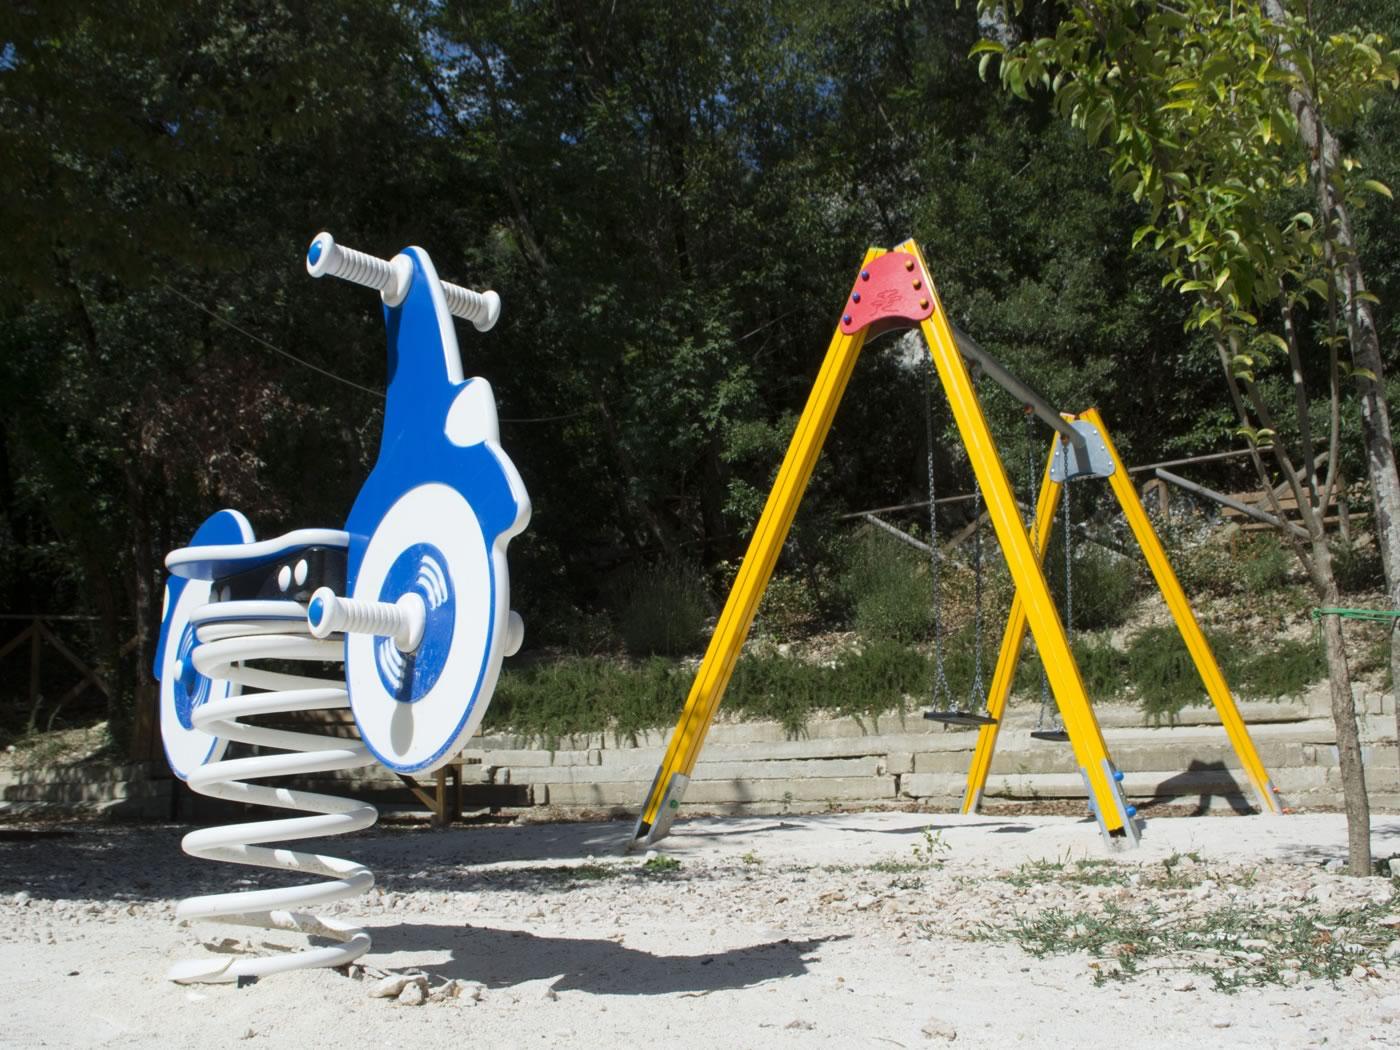 parco giochi sassovivo altalena